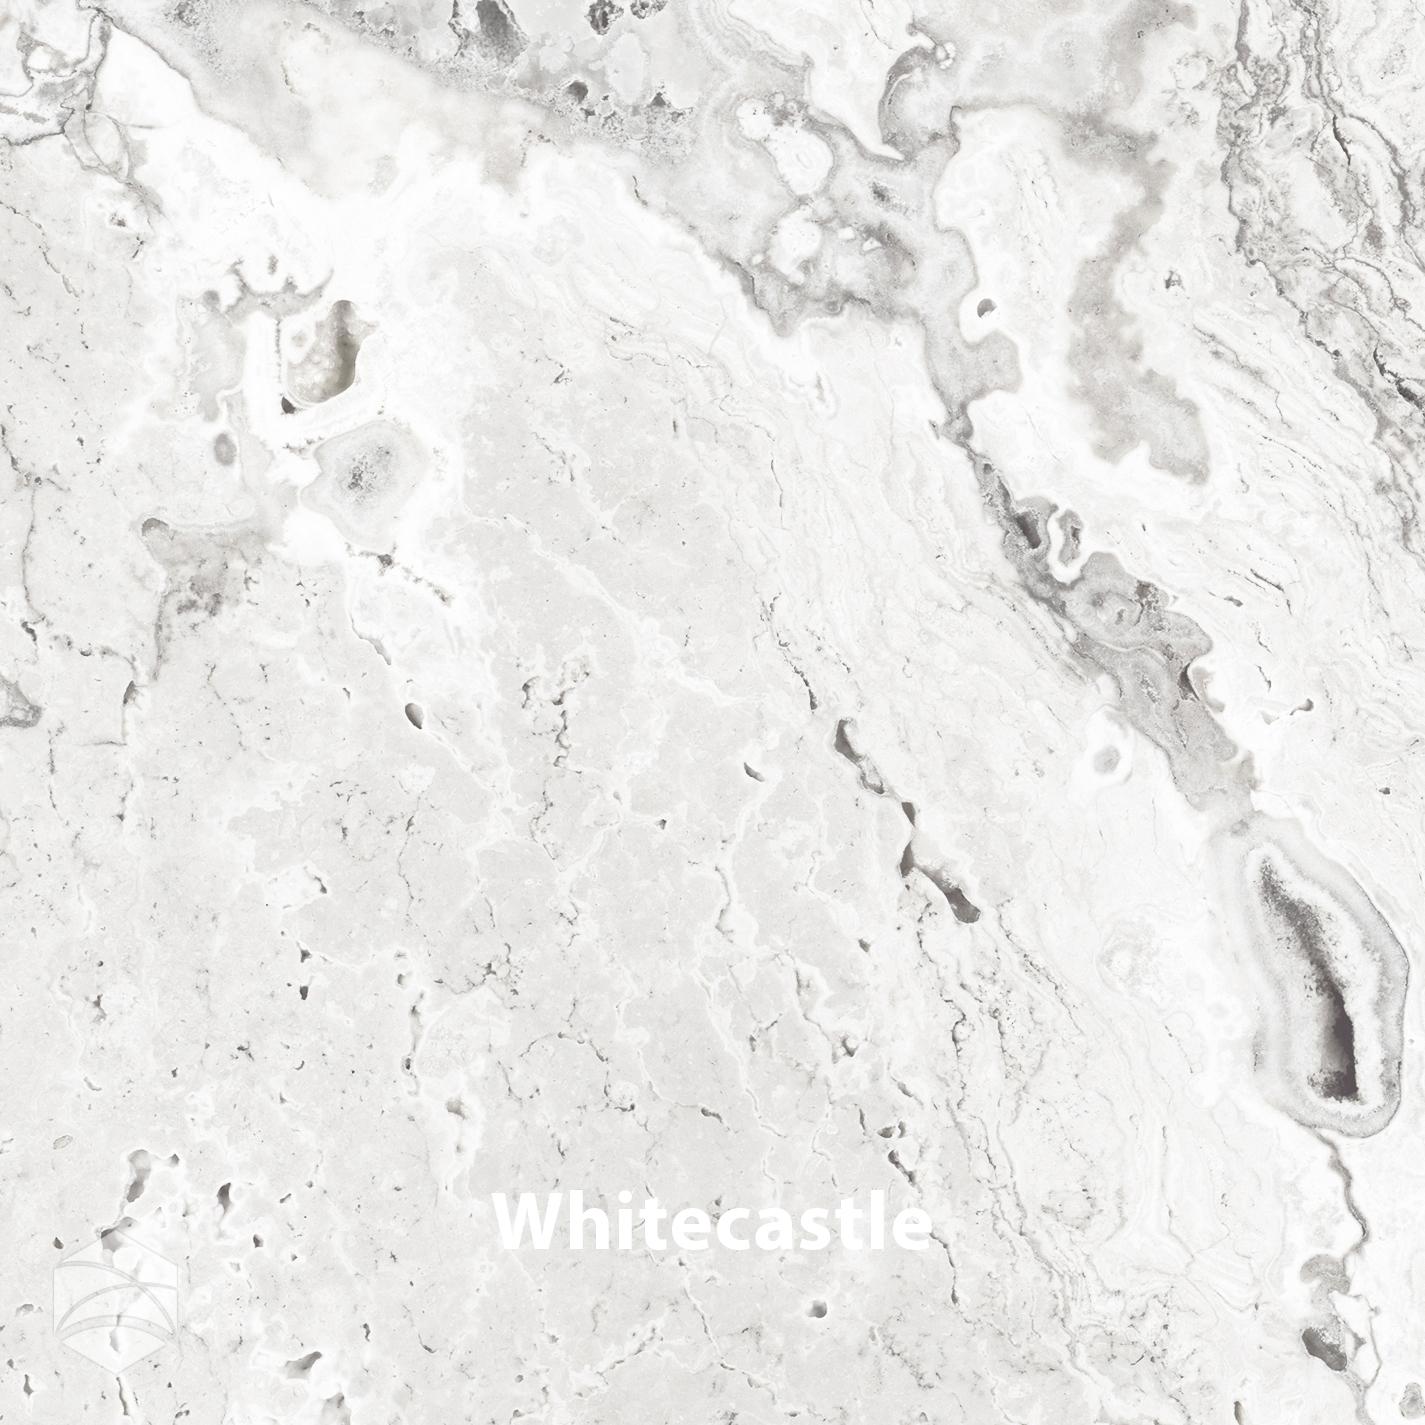 Whitecastle_V2_14x14.jpg